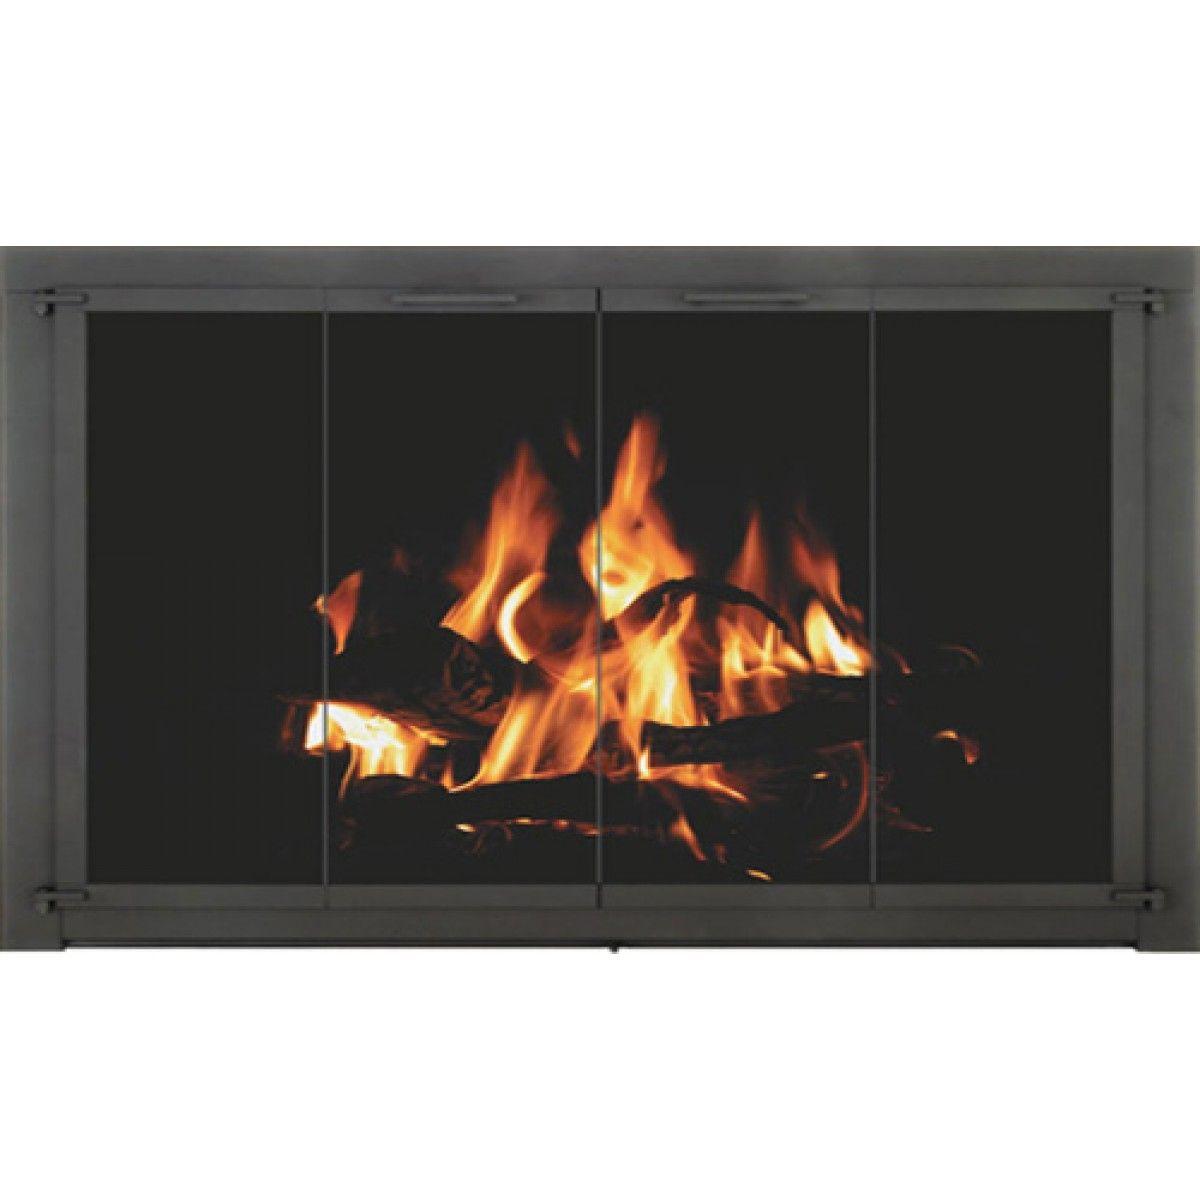 The Crestone For Temco Fireplaces Temco Fireplace Doors